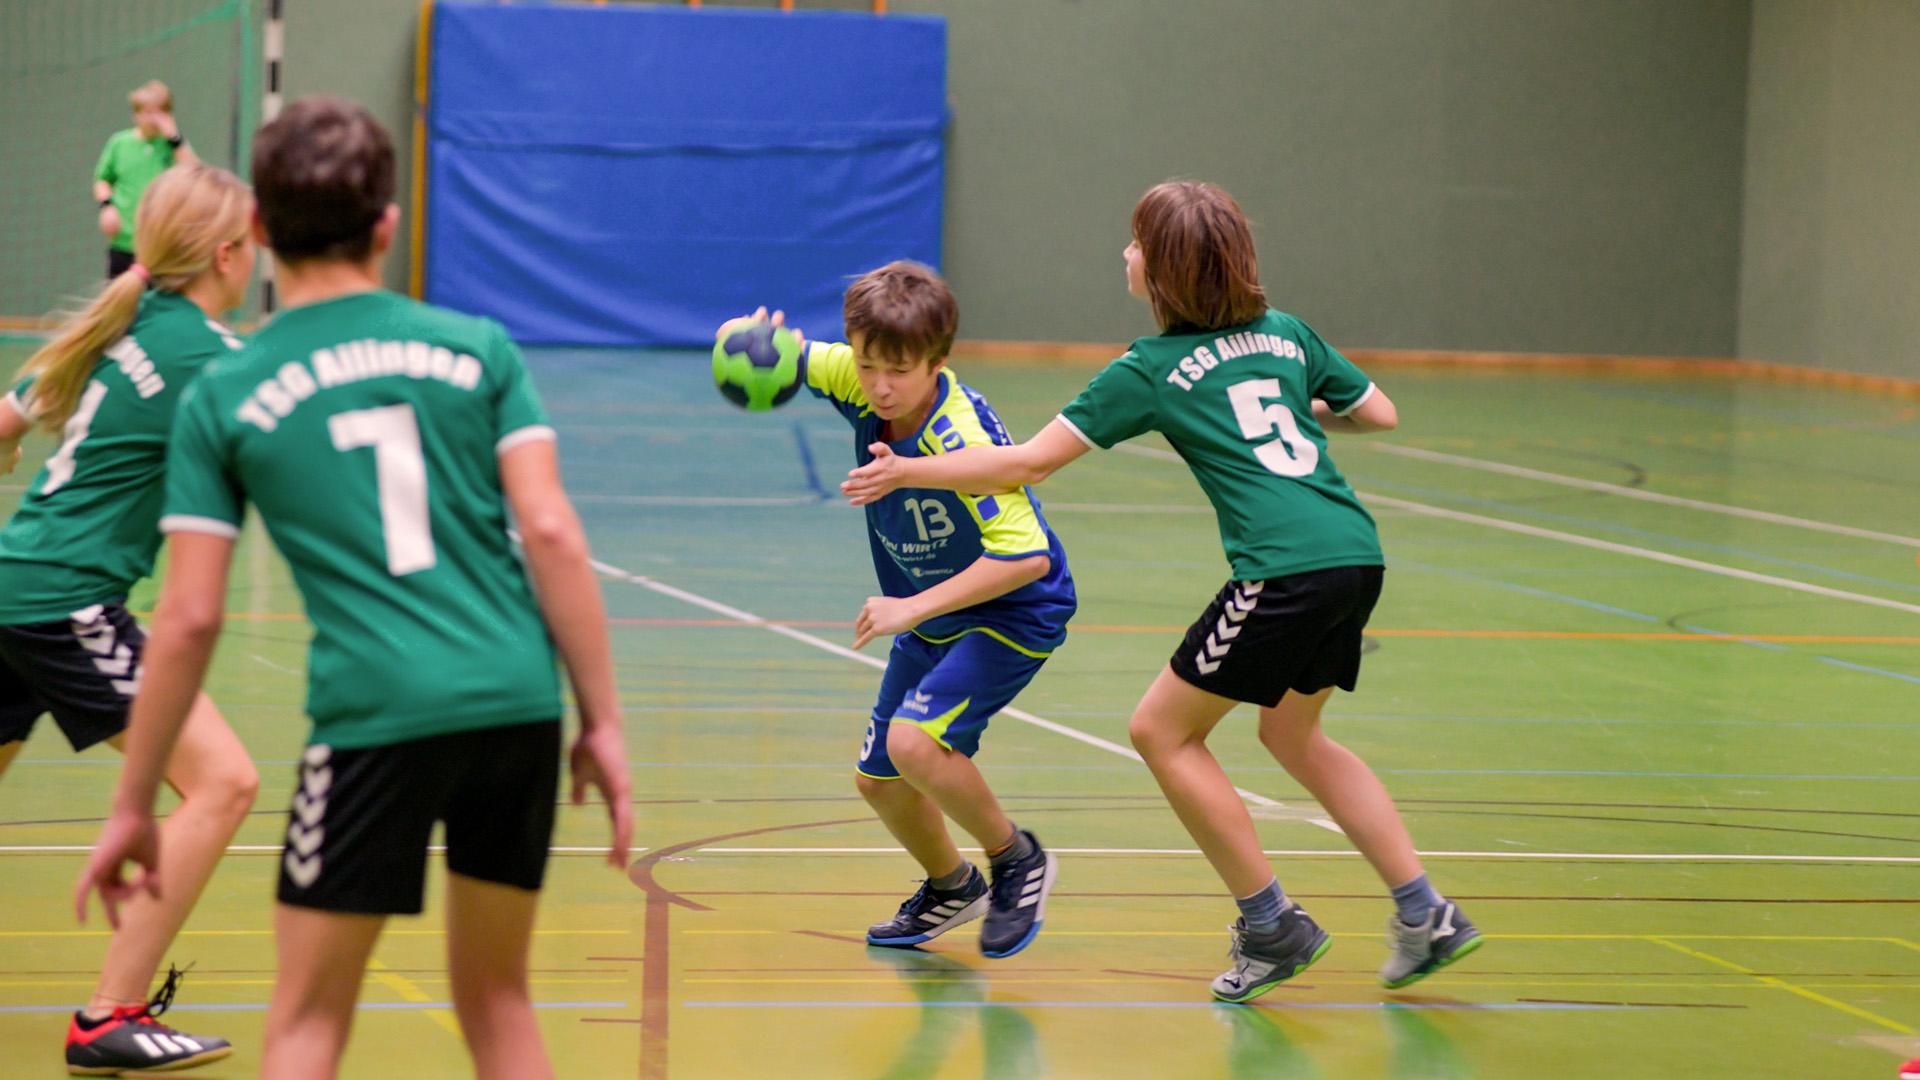 015Slider_mD_tsg_leutkirch_handball